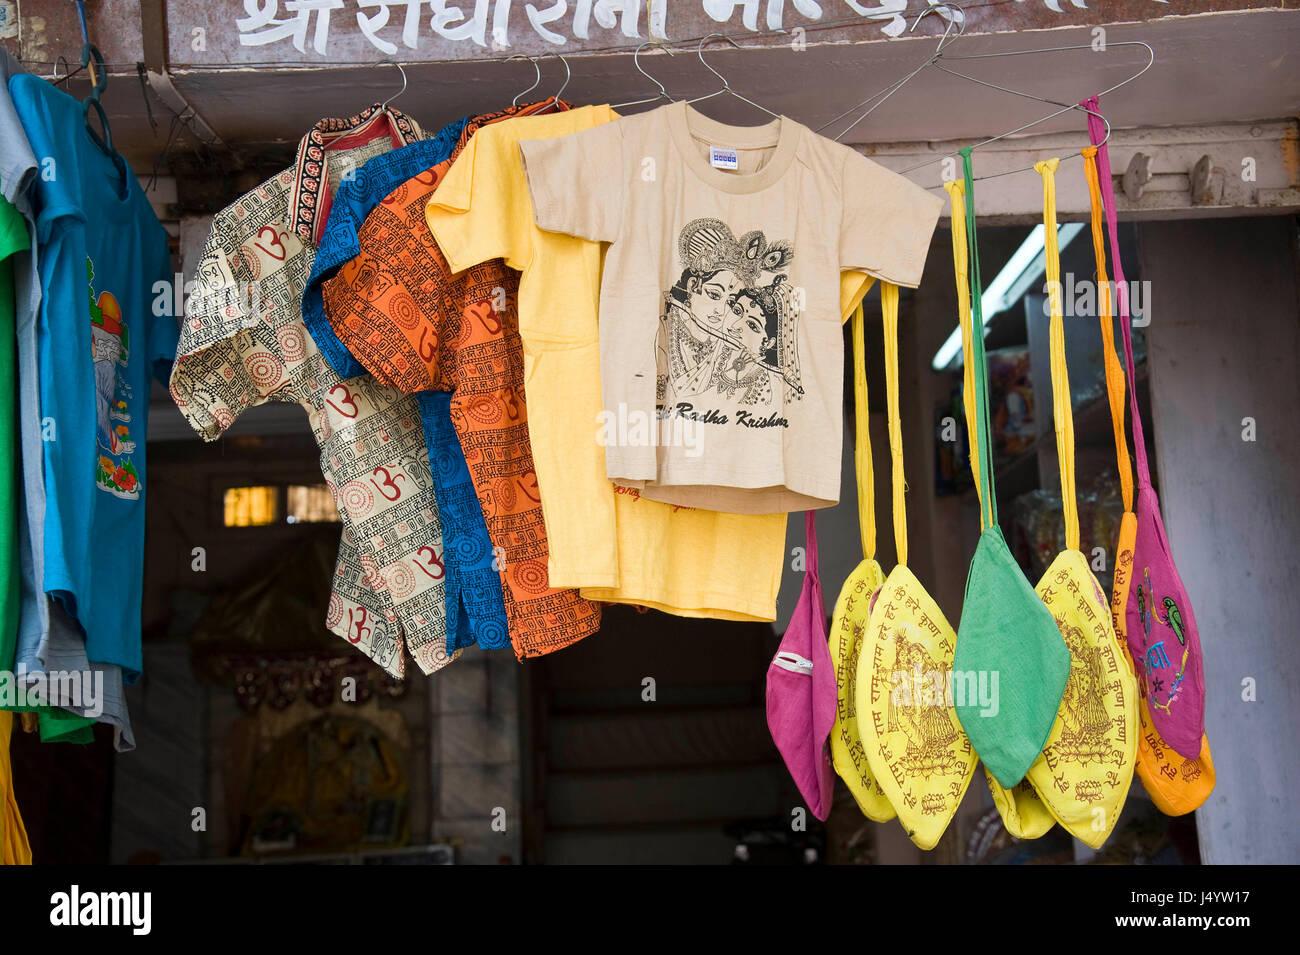 Printed radha krishna on t shirts, mathura, uttar pradesh, india, asia - Stock Image